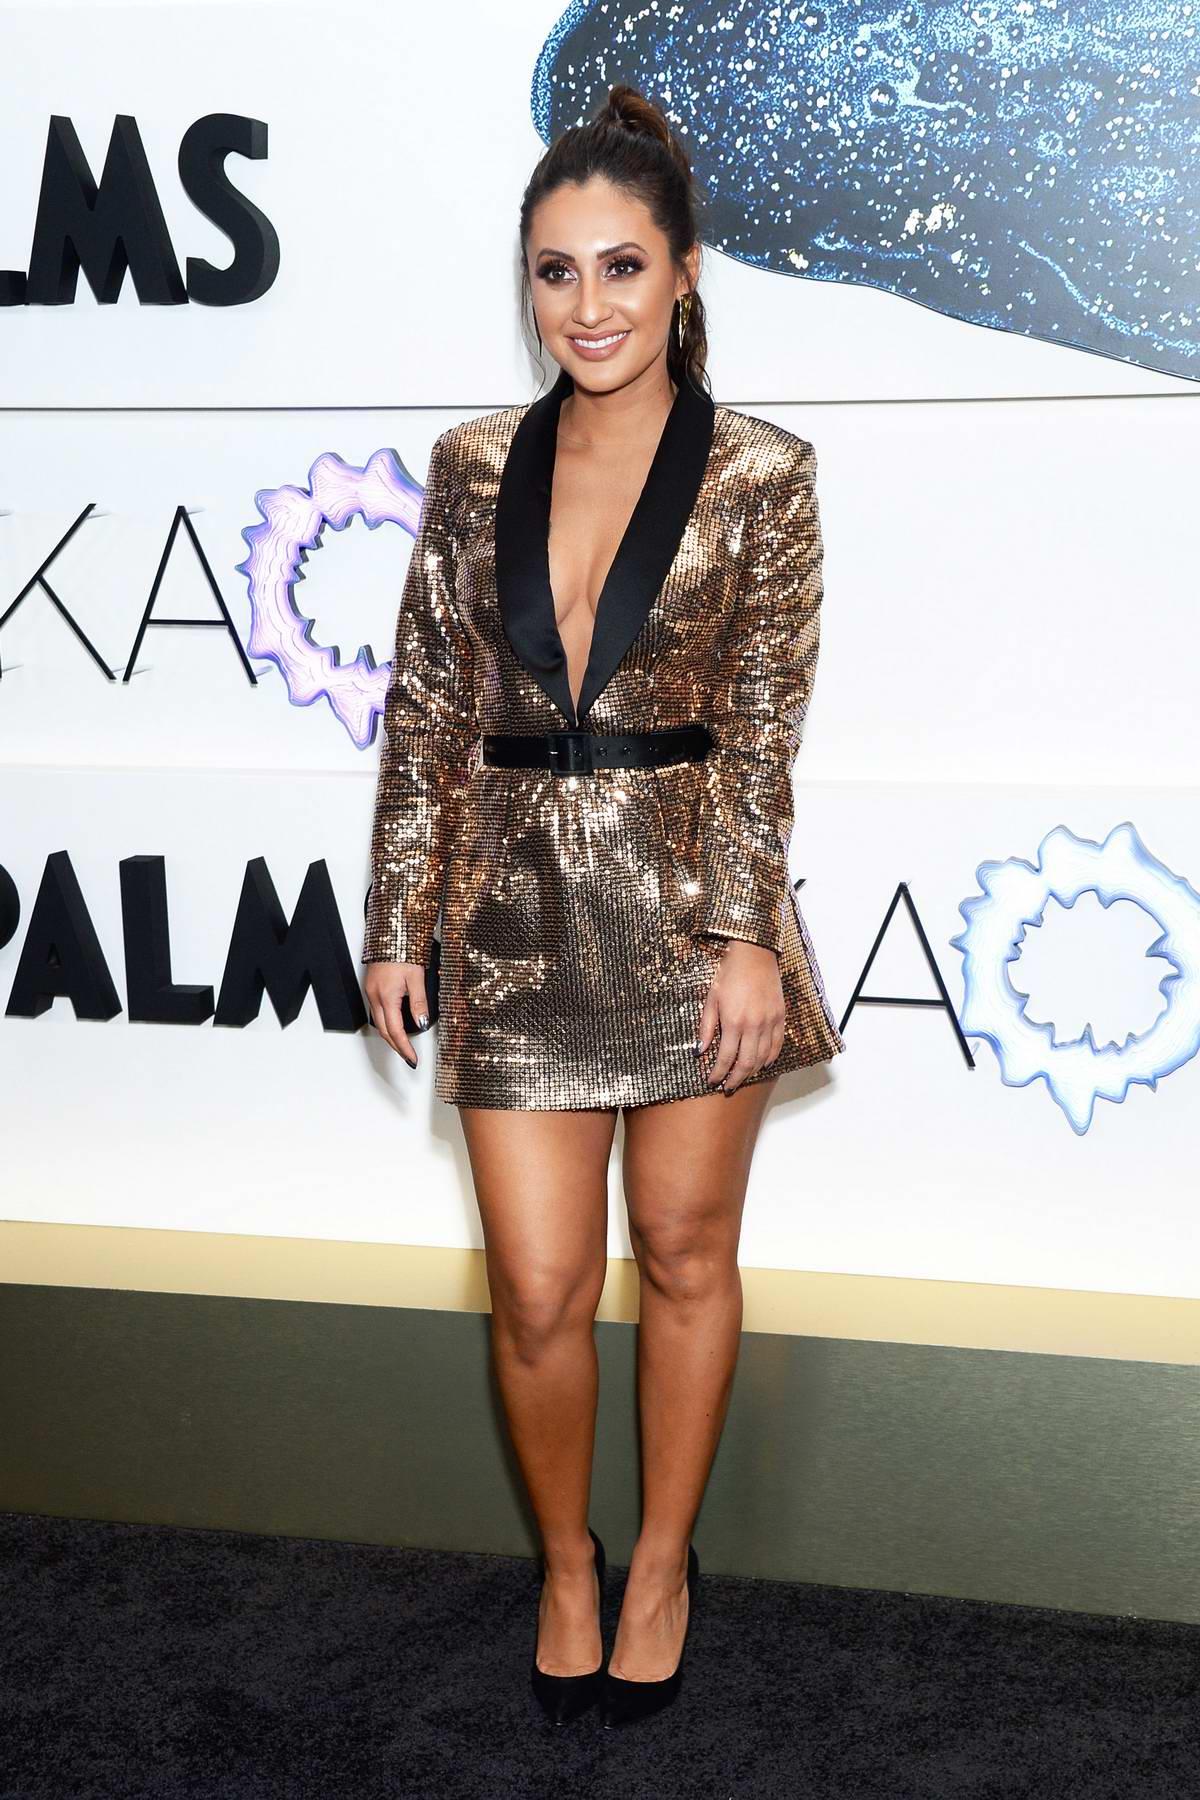 Francia Raisa attends the KAOS Grand Opening at Palms Casino Resort in Las Vegas, Nevada